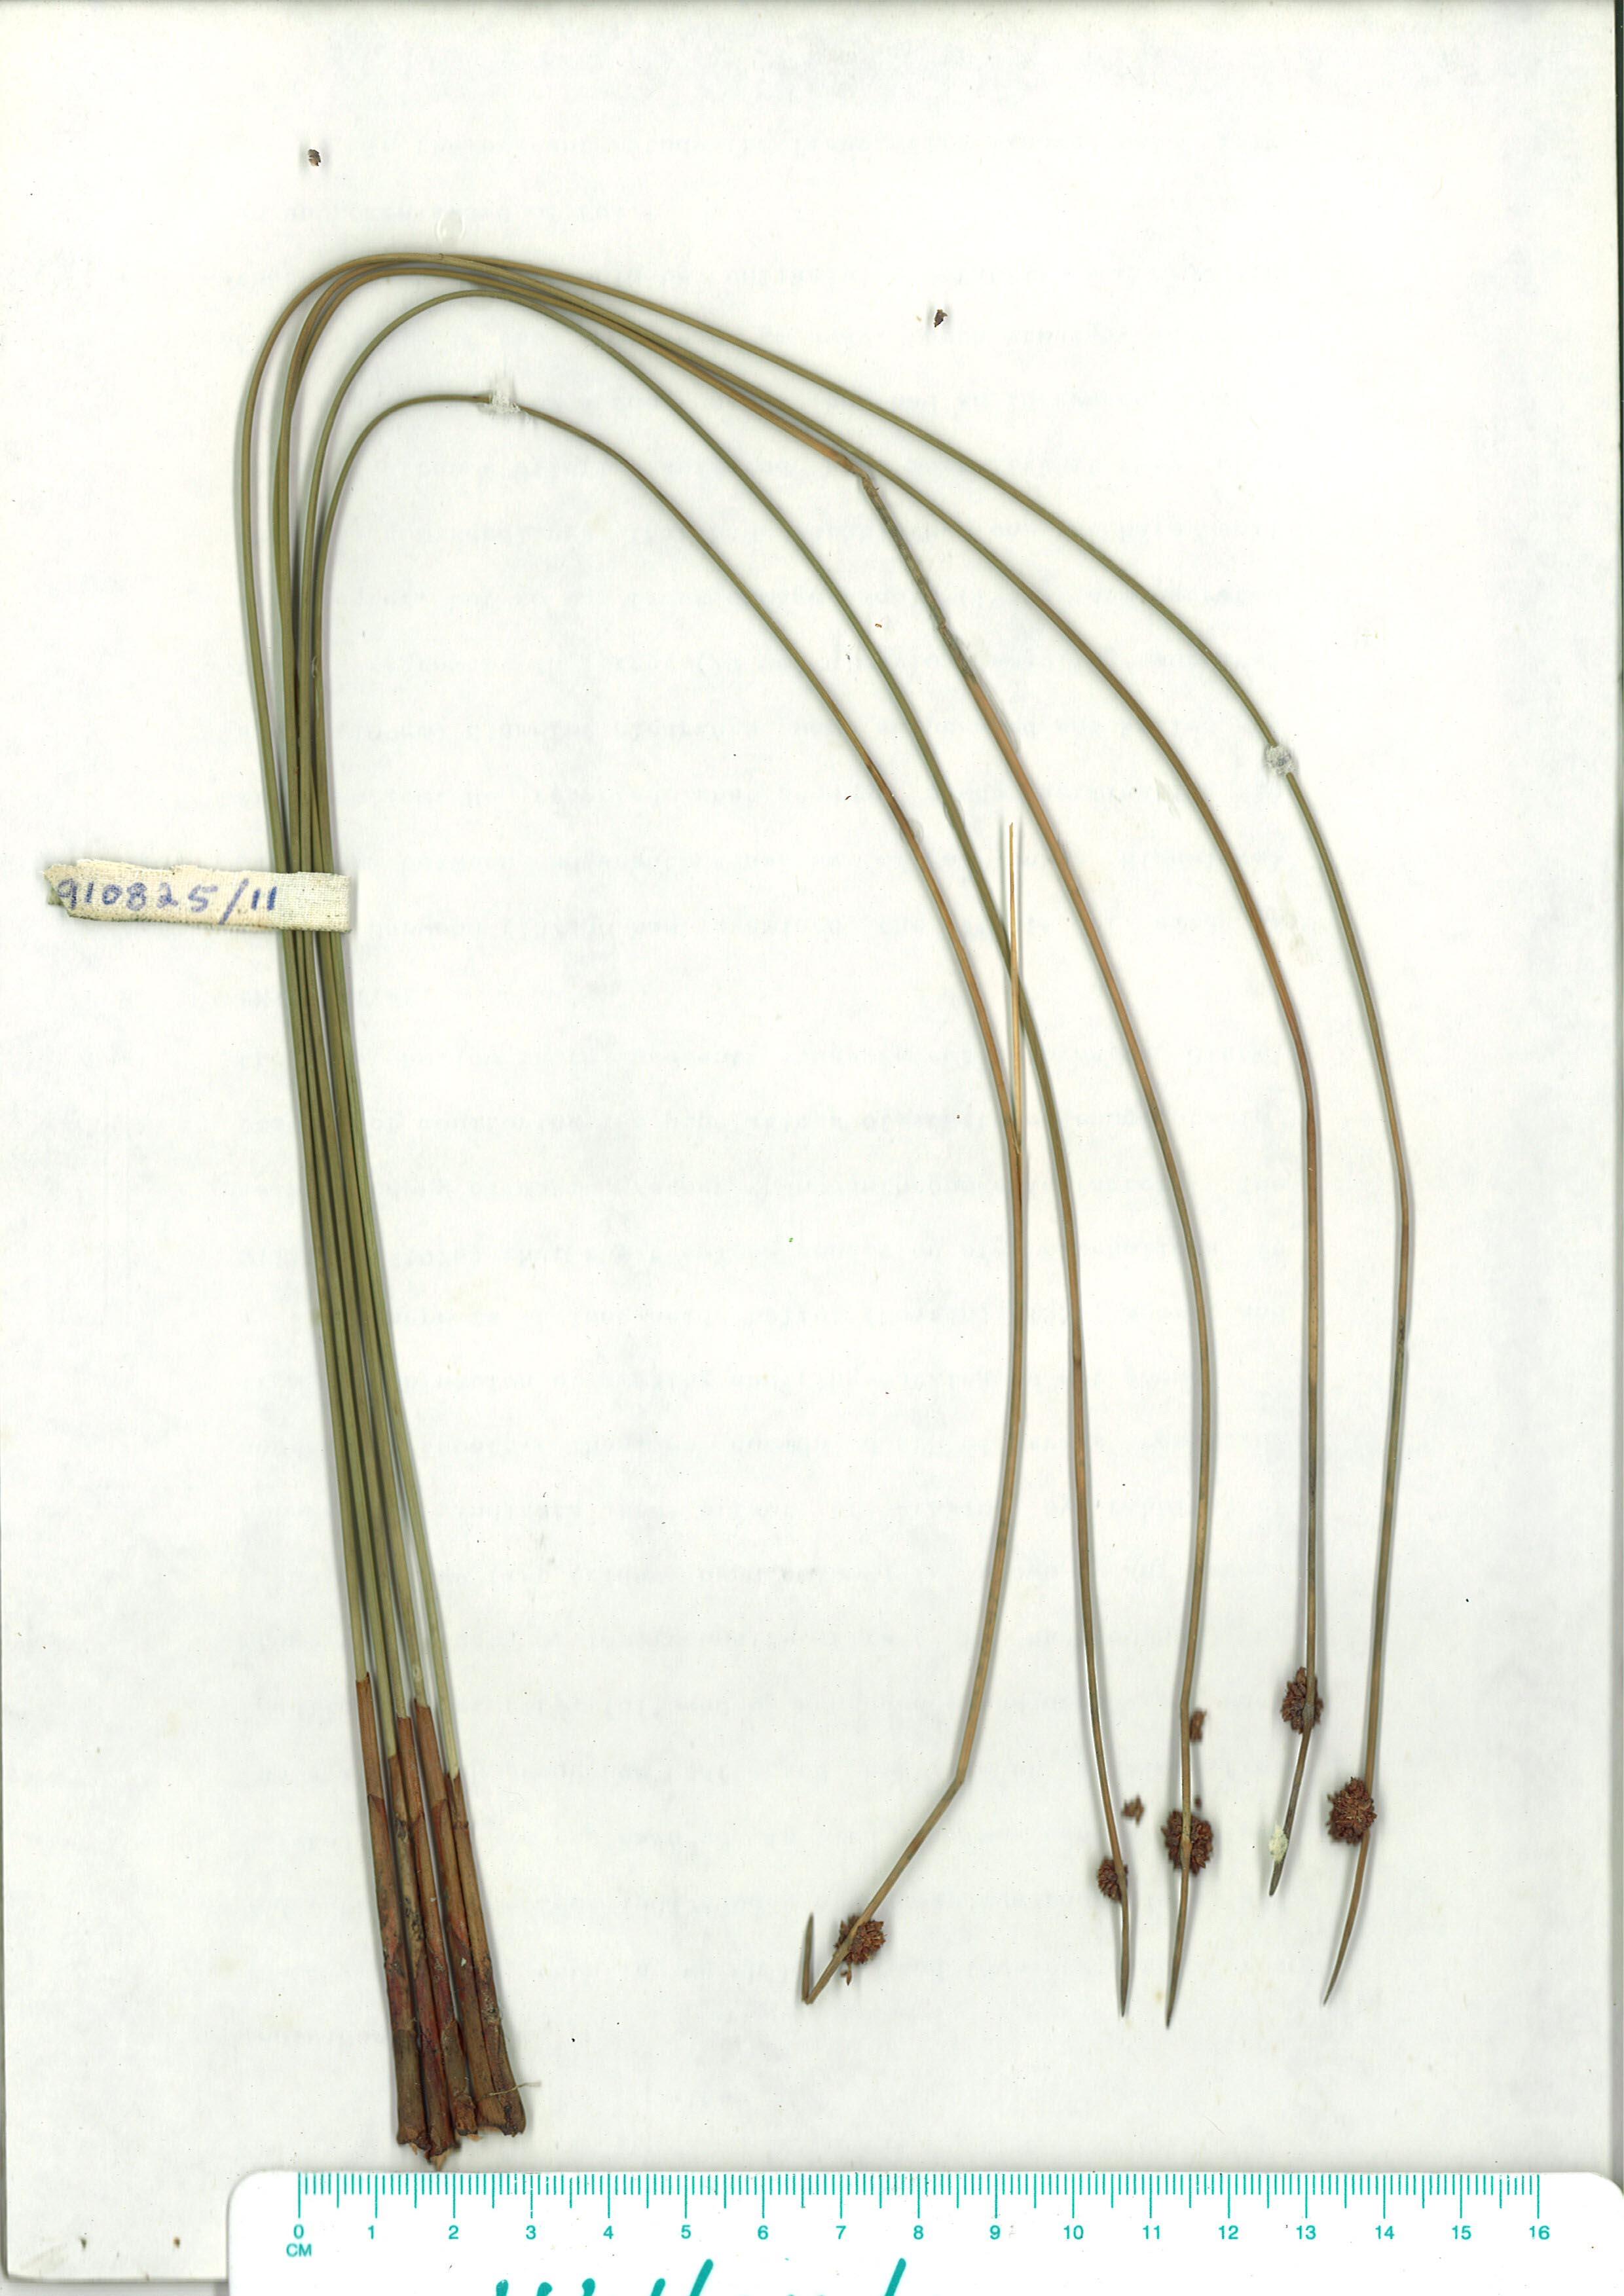 Scanned herbarium image isolebis nodosa